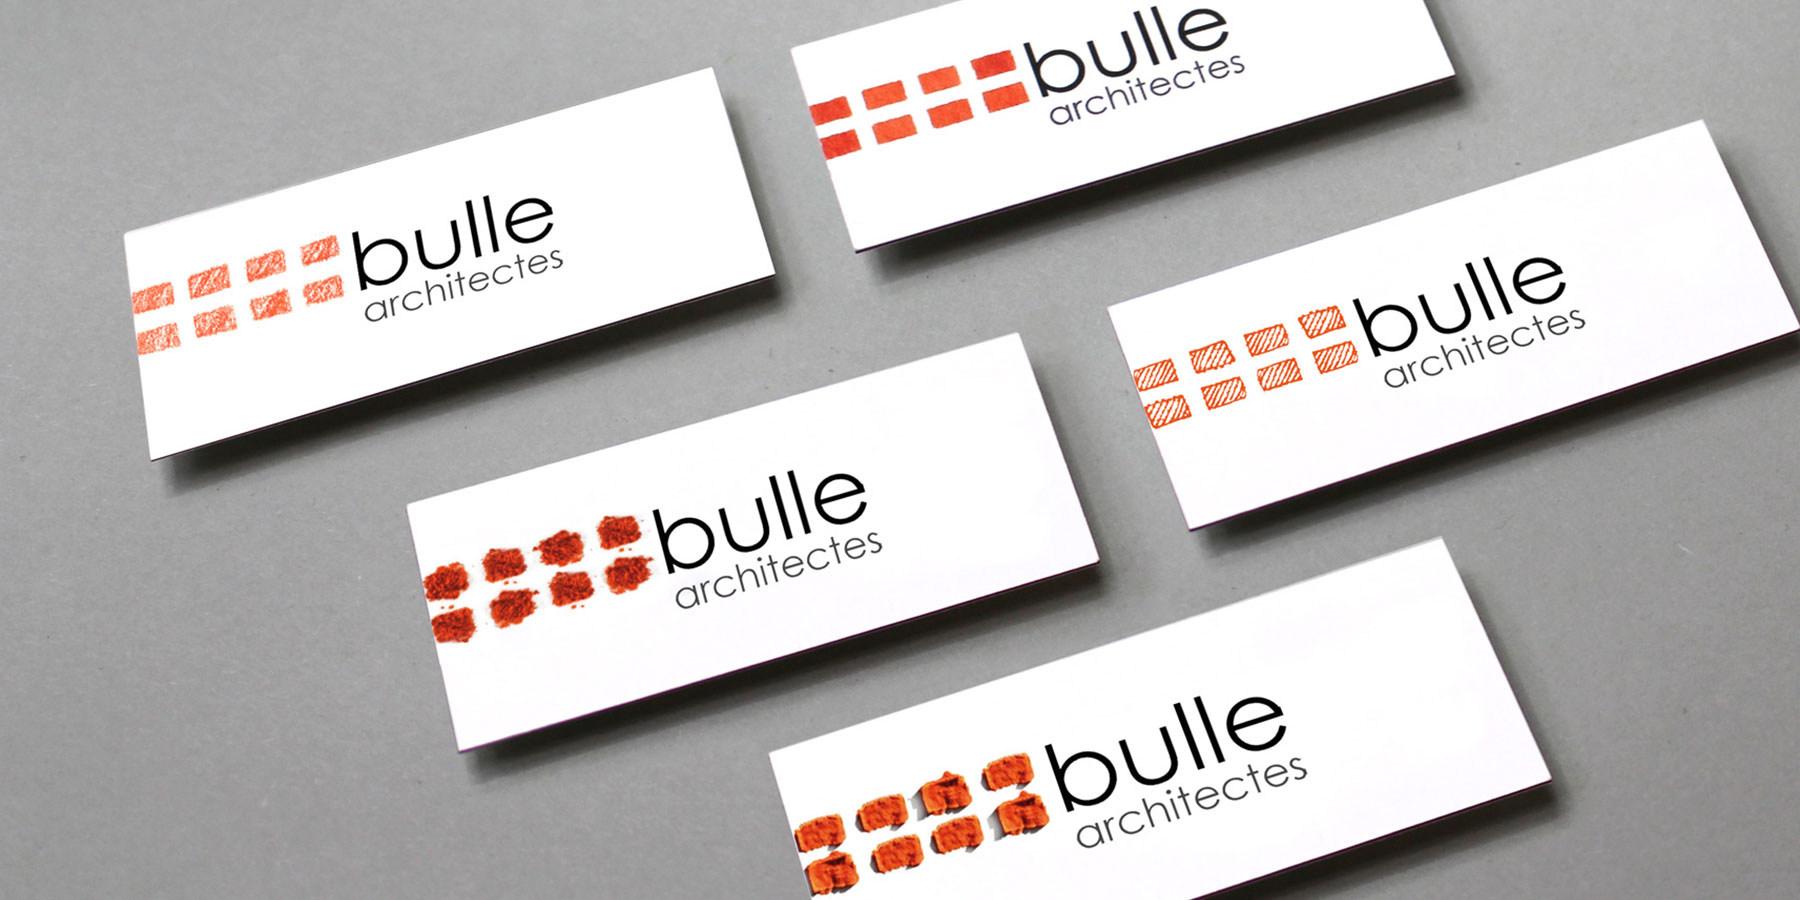 BULLE Architectes